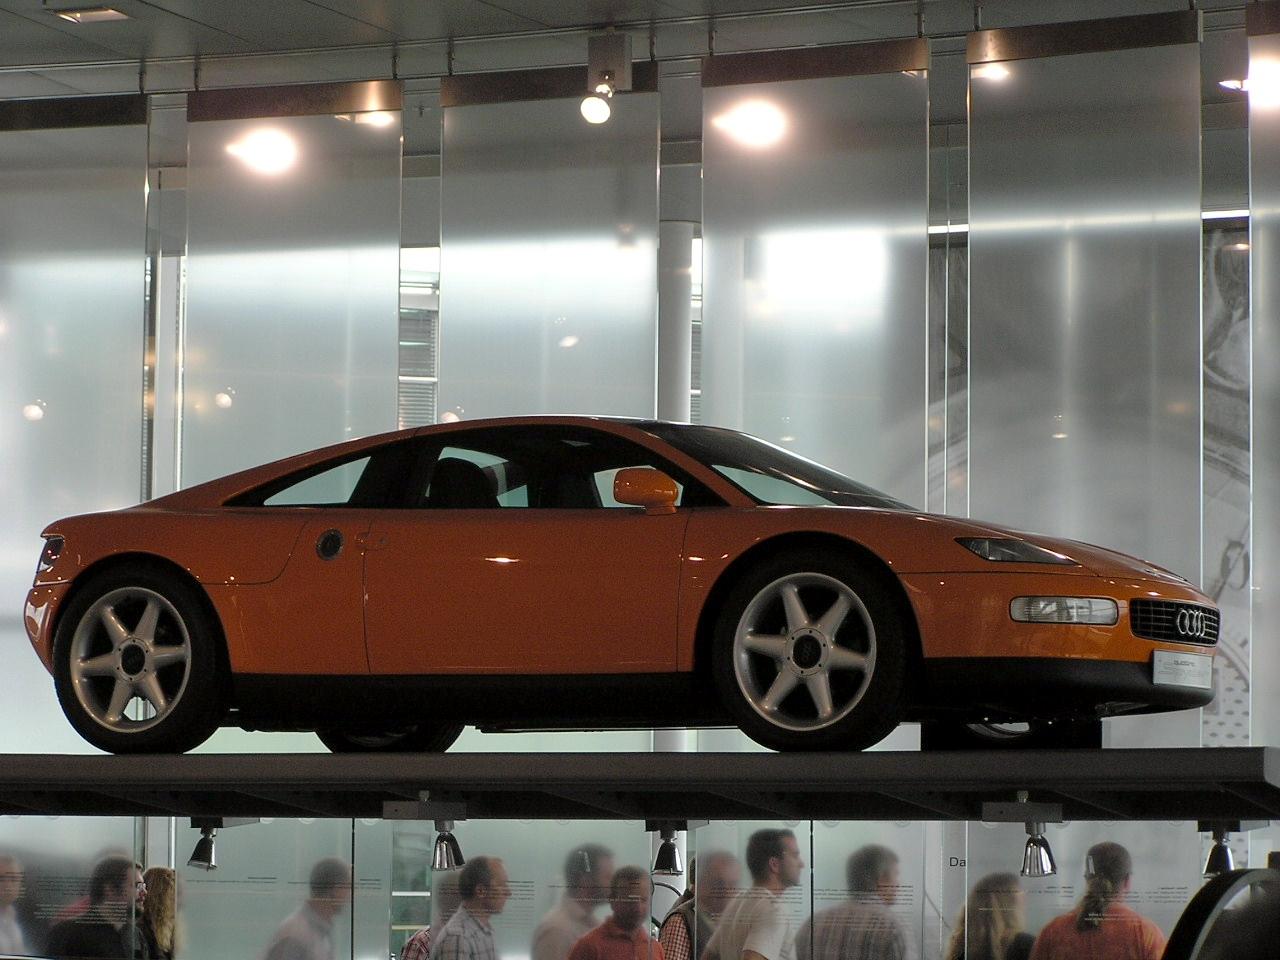 File:Audi Quattro Spyder.JPG - Wikimedia Commons